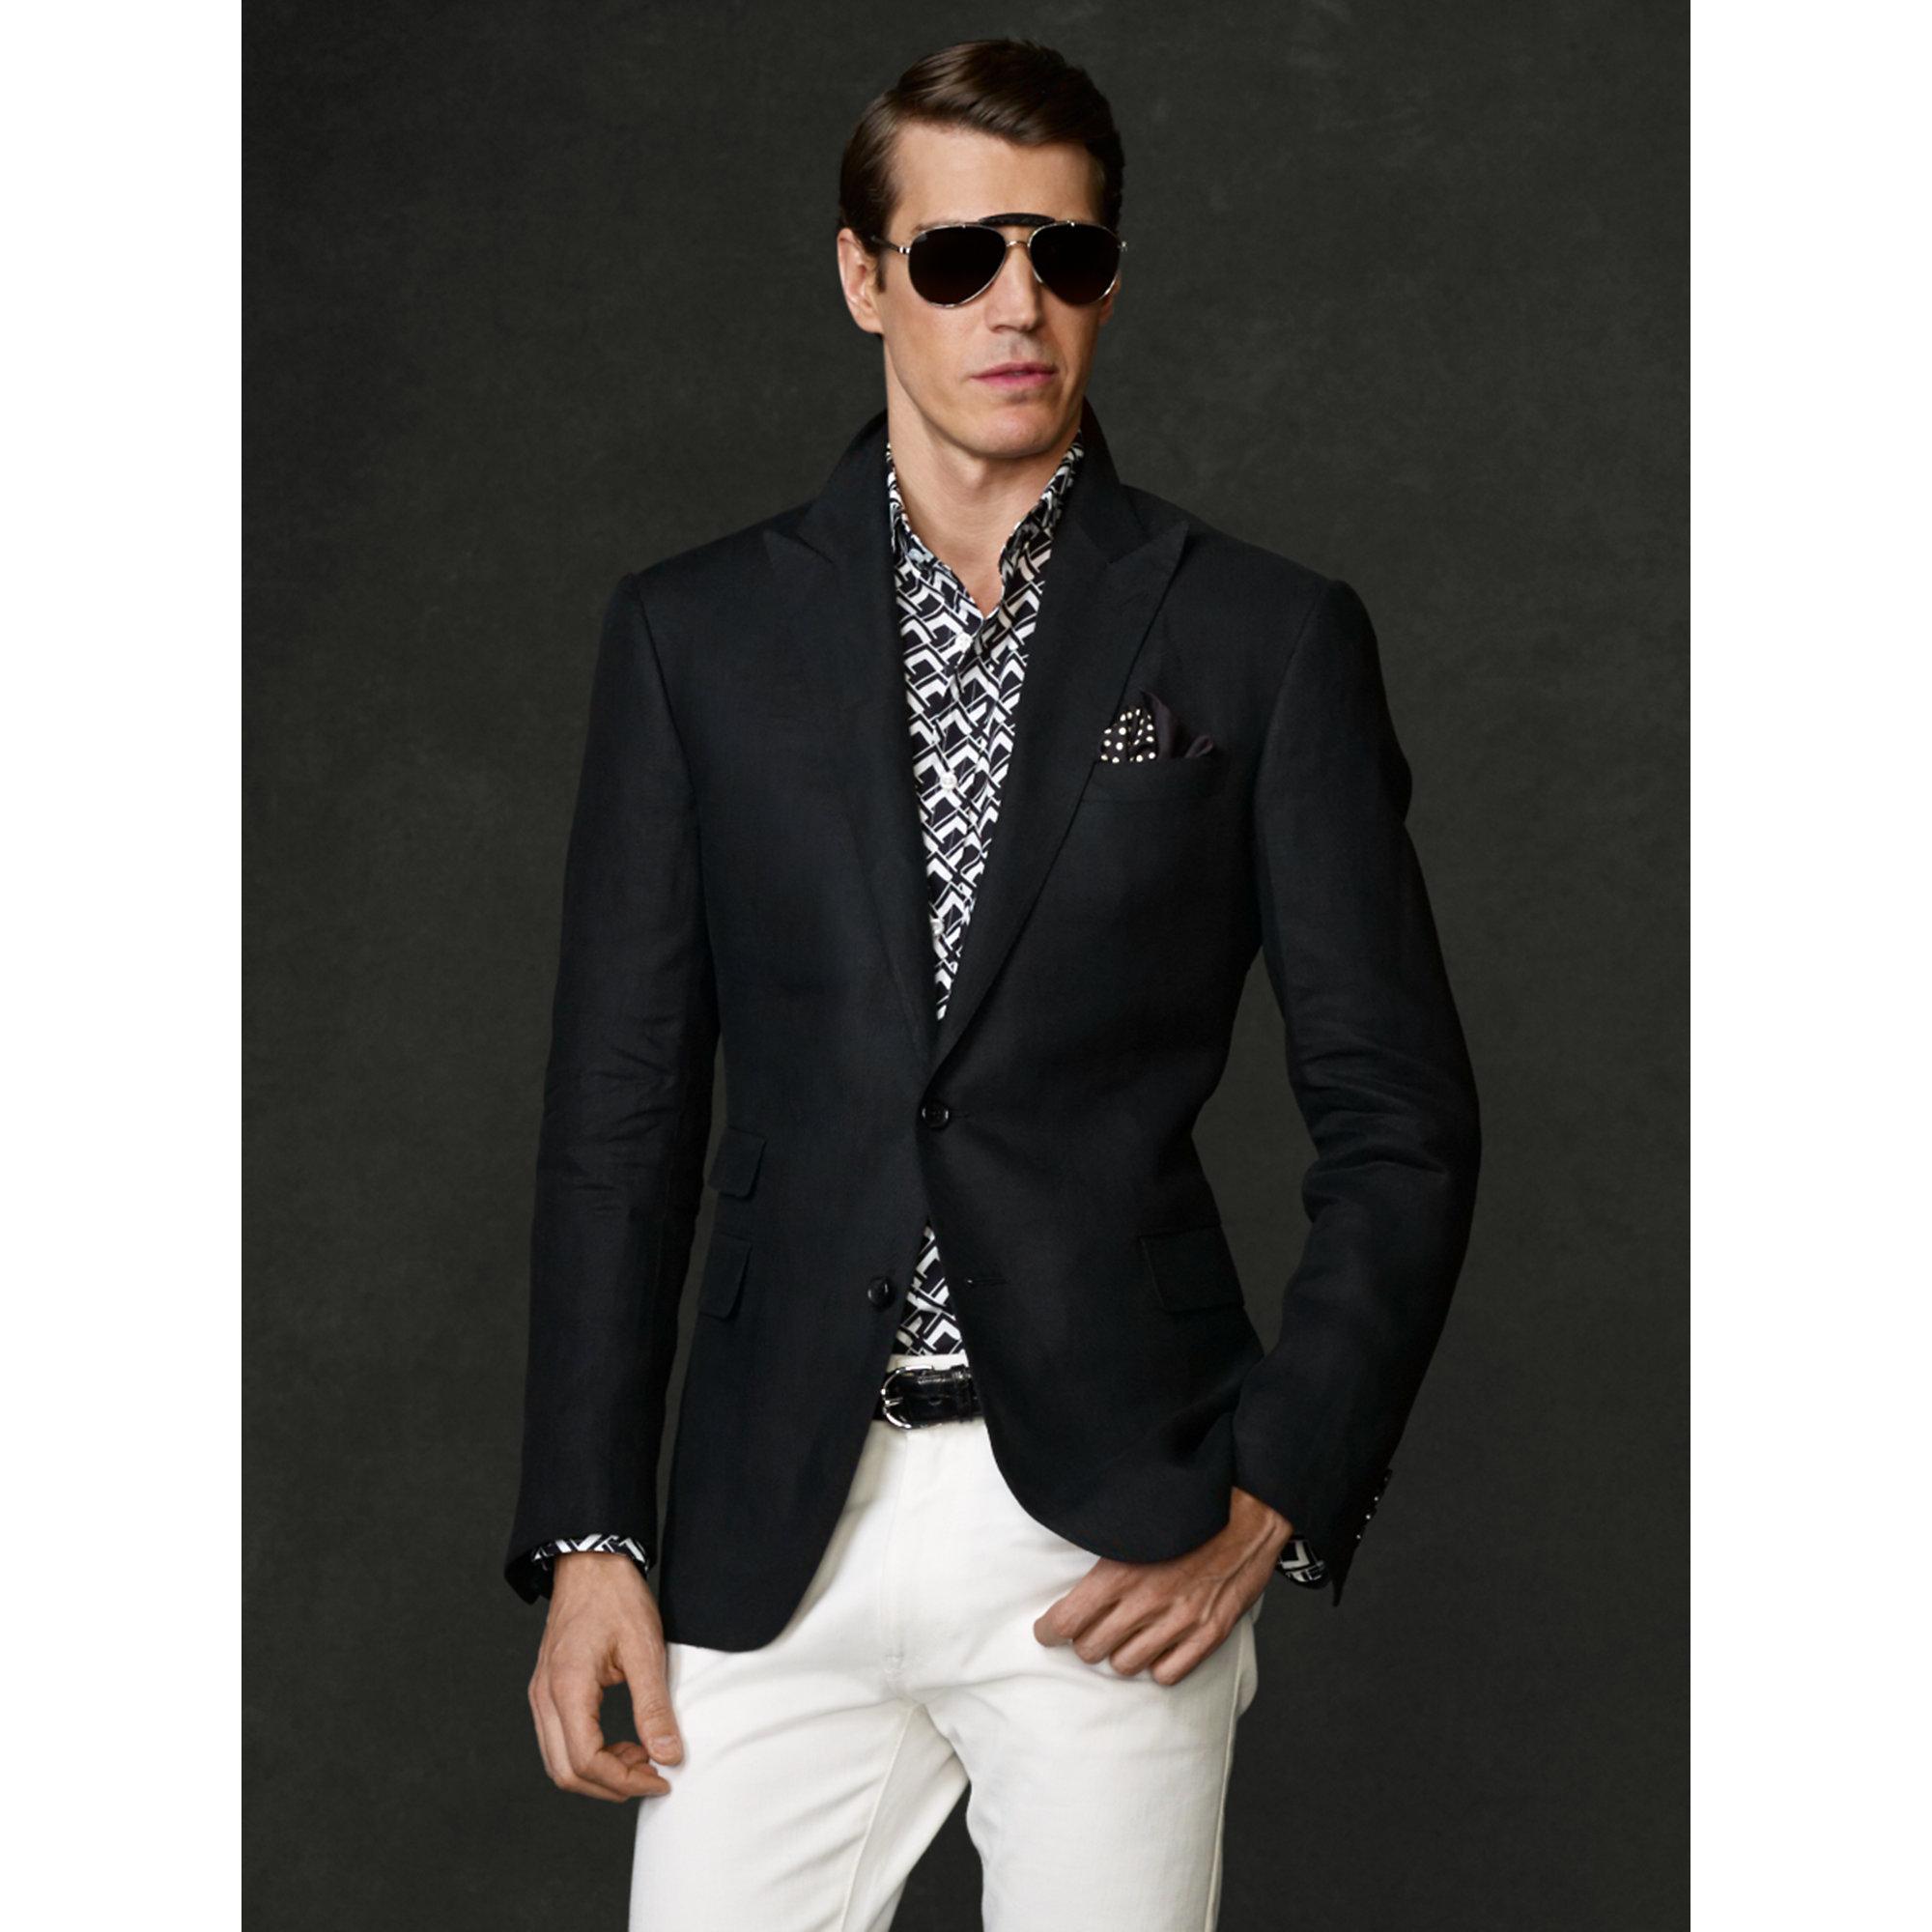 2b67efb40c86 Ralph Lauren Purple Label Custom-Fit Linen Sport Coat in Black for ...